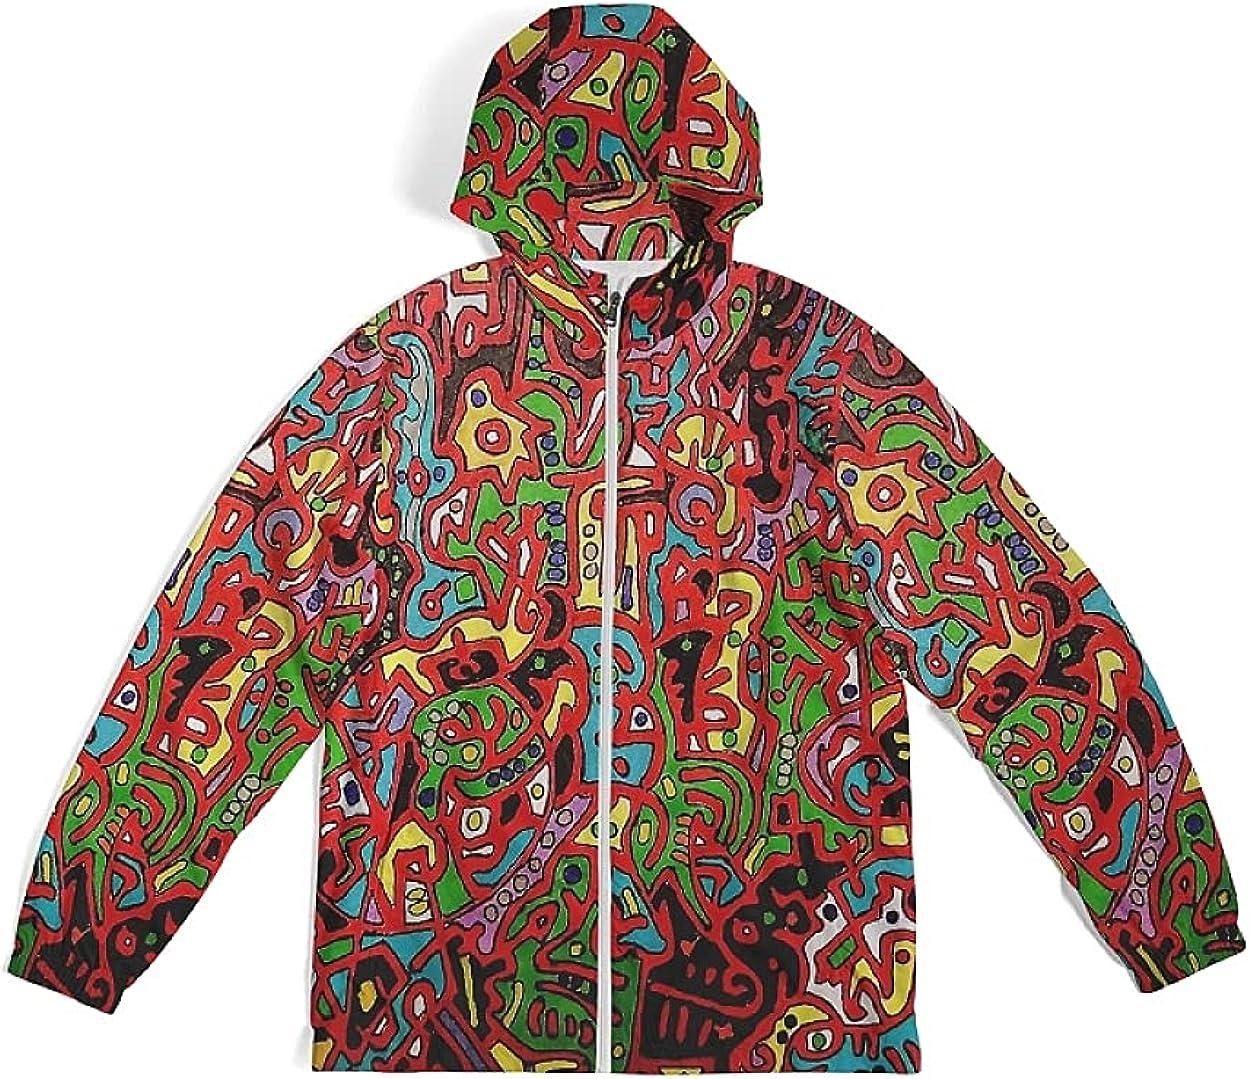 Men's Packable Rain Jacket Waterproof Windbreaker Lightweight Raincoat with Hood